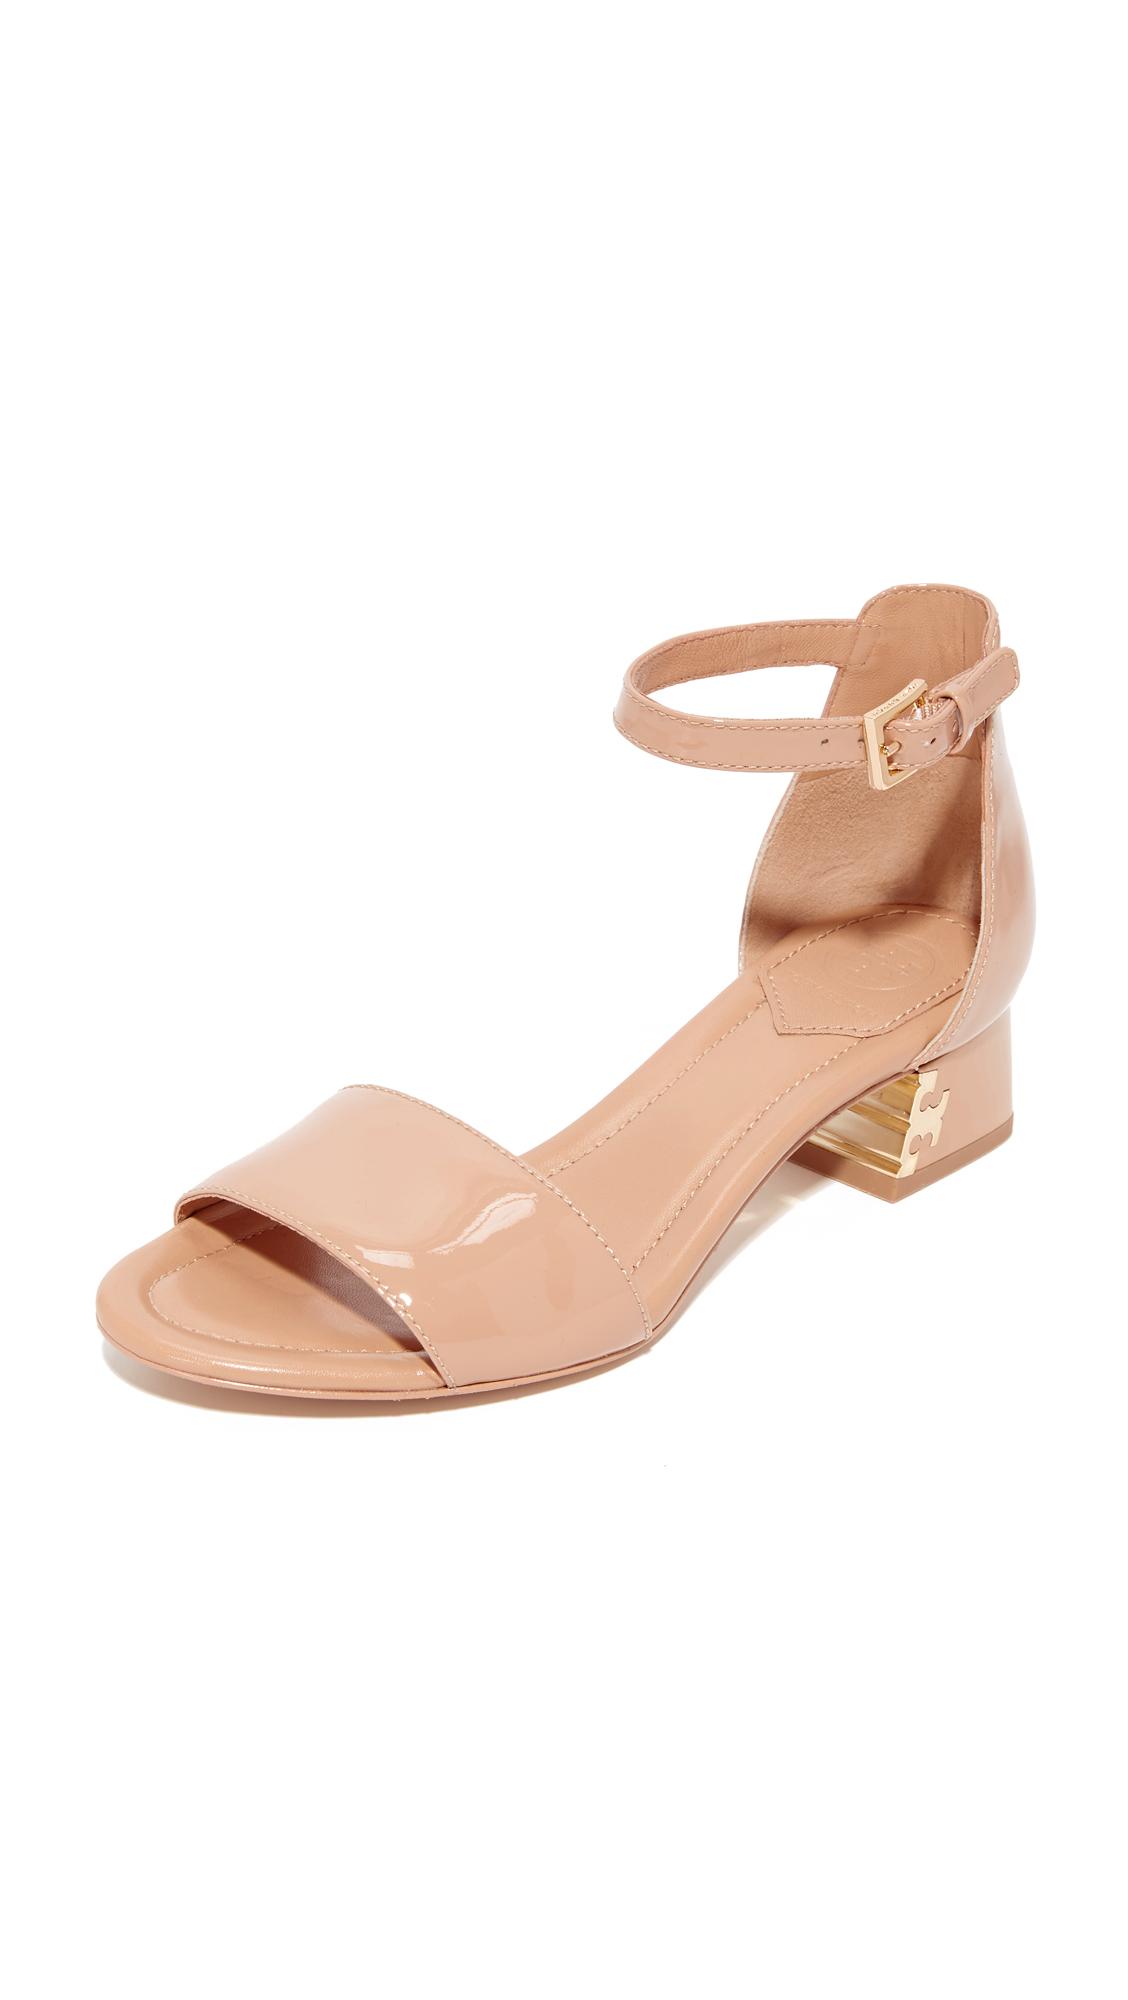 e6a5358295b36 Tory Burch Finely City Sandals